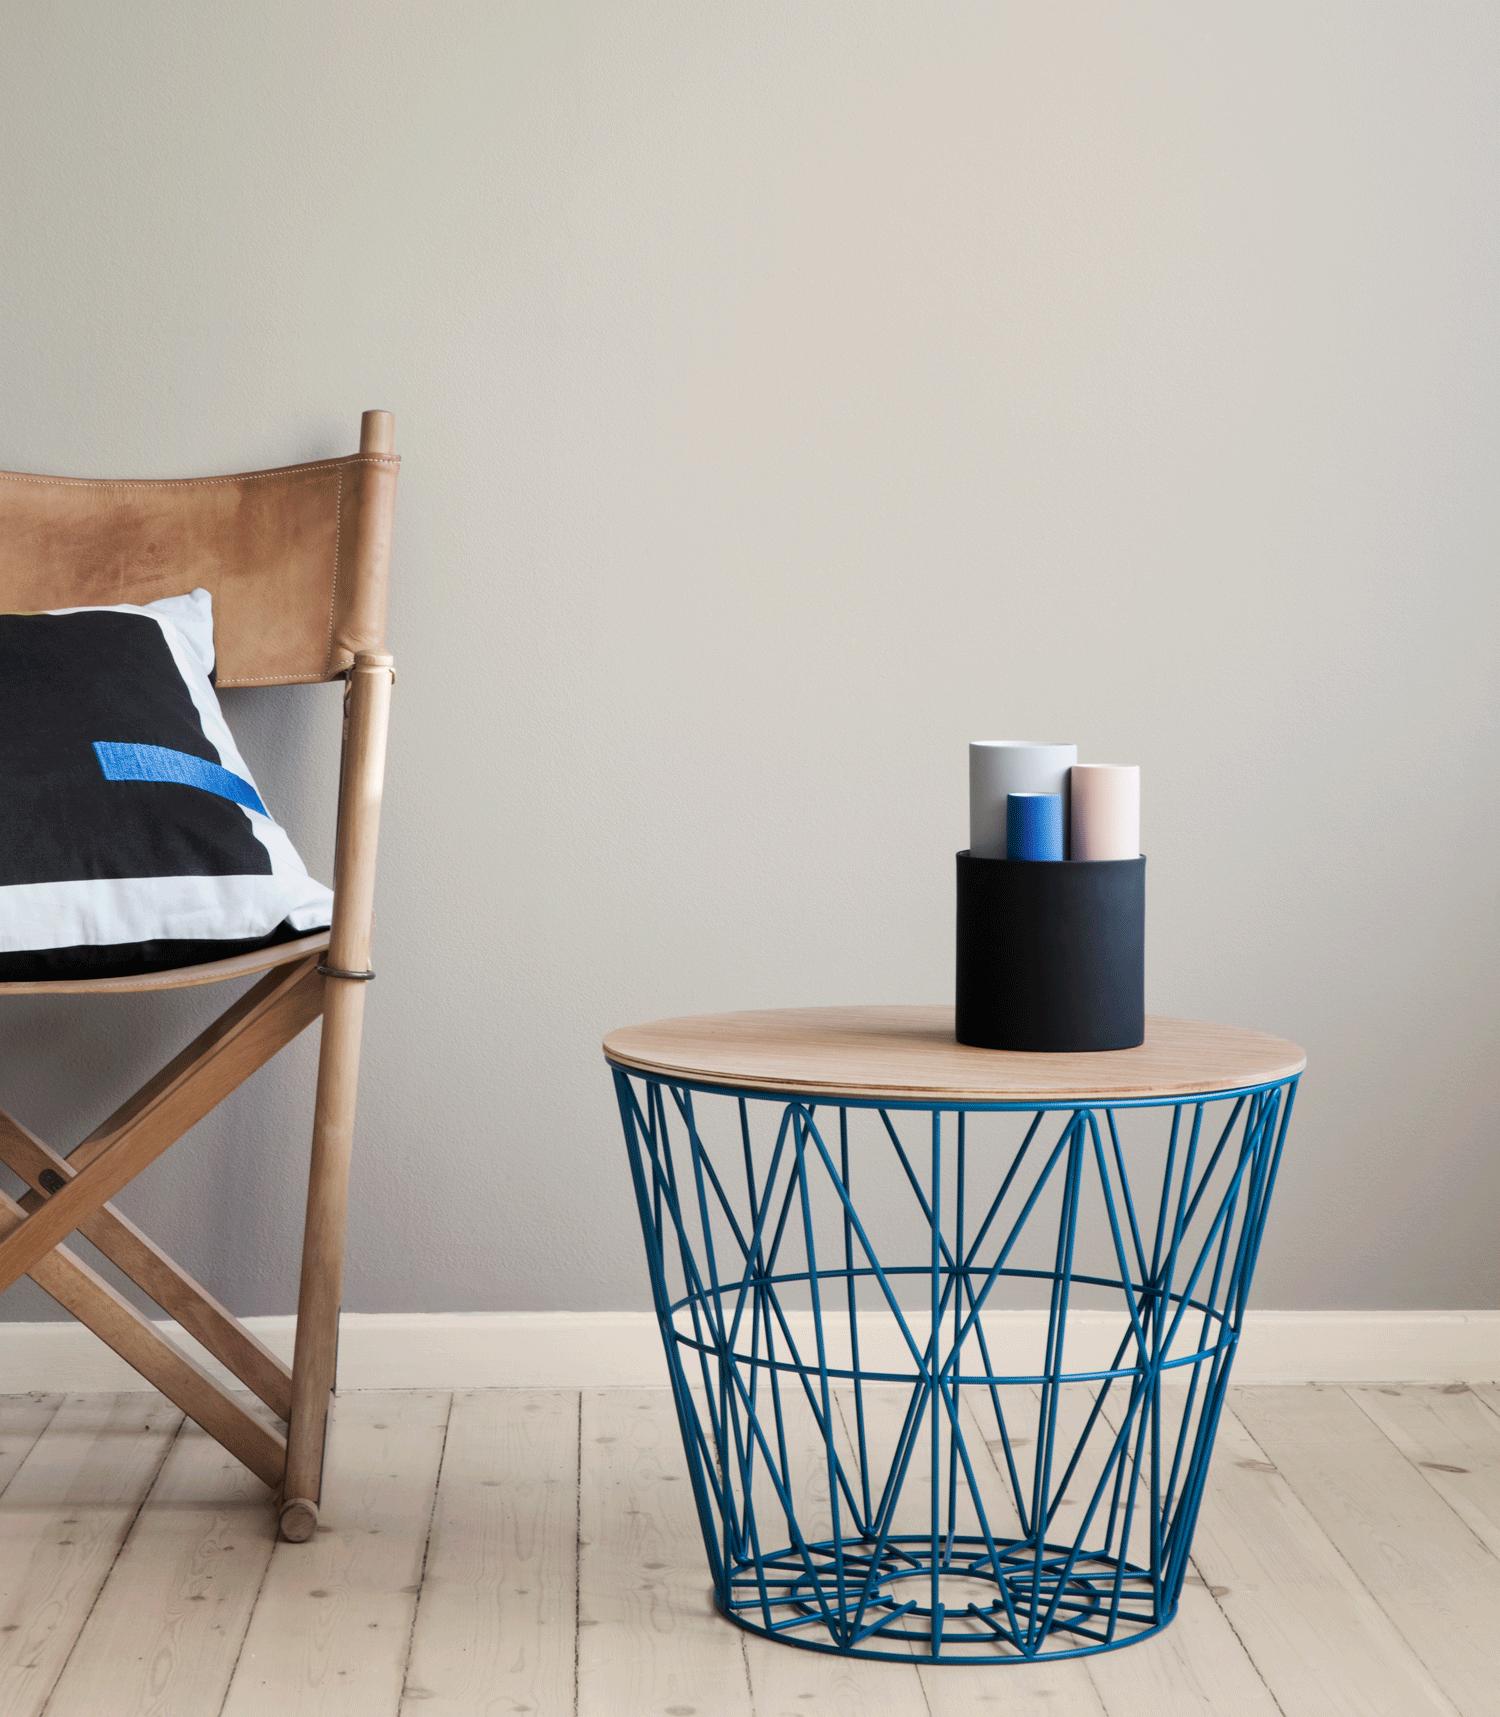 rangement 20 solutions esth tiques et astucieuses qui. Black Bedroom Furniture Sets. Home Design Ideas